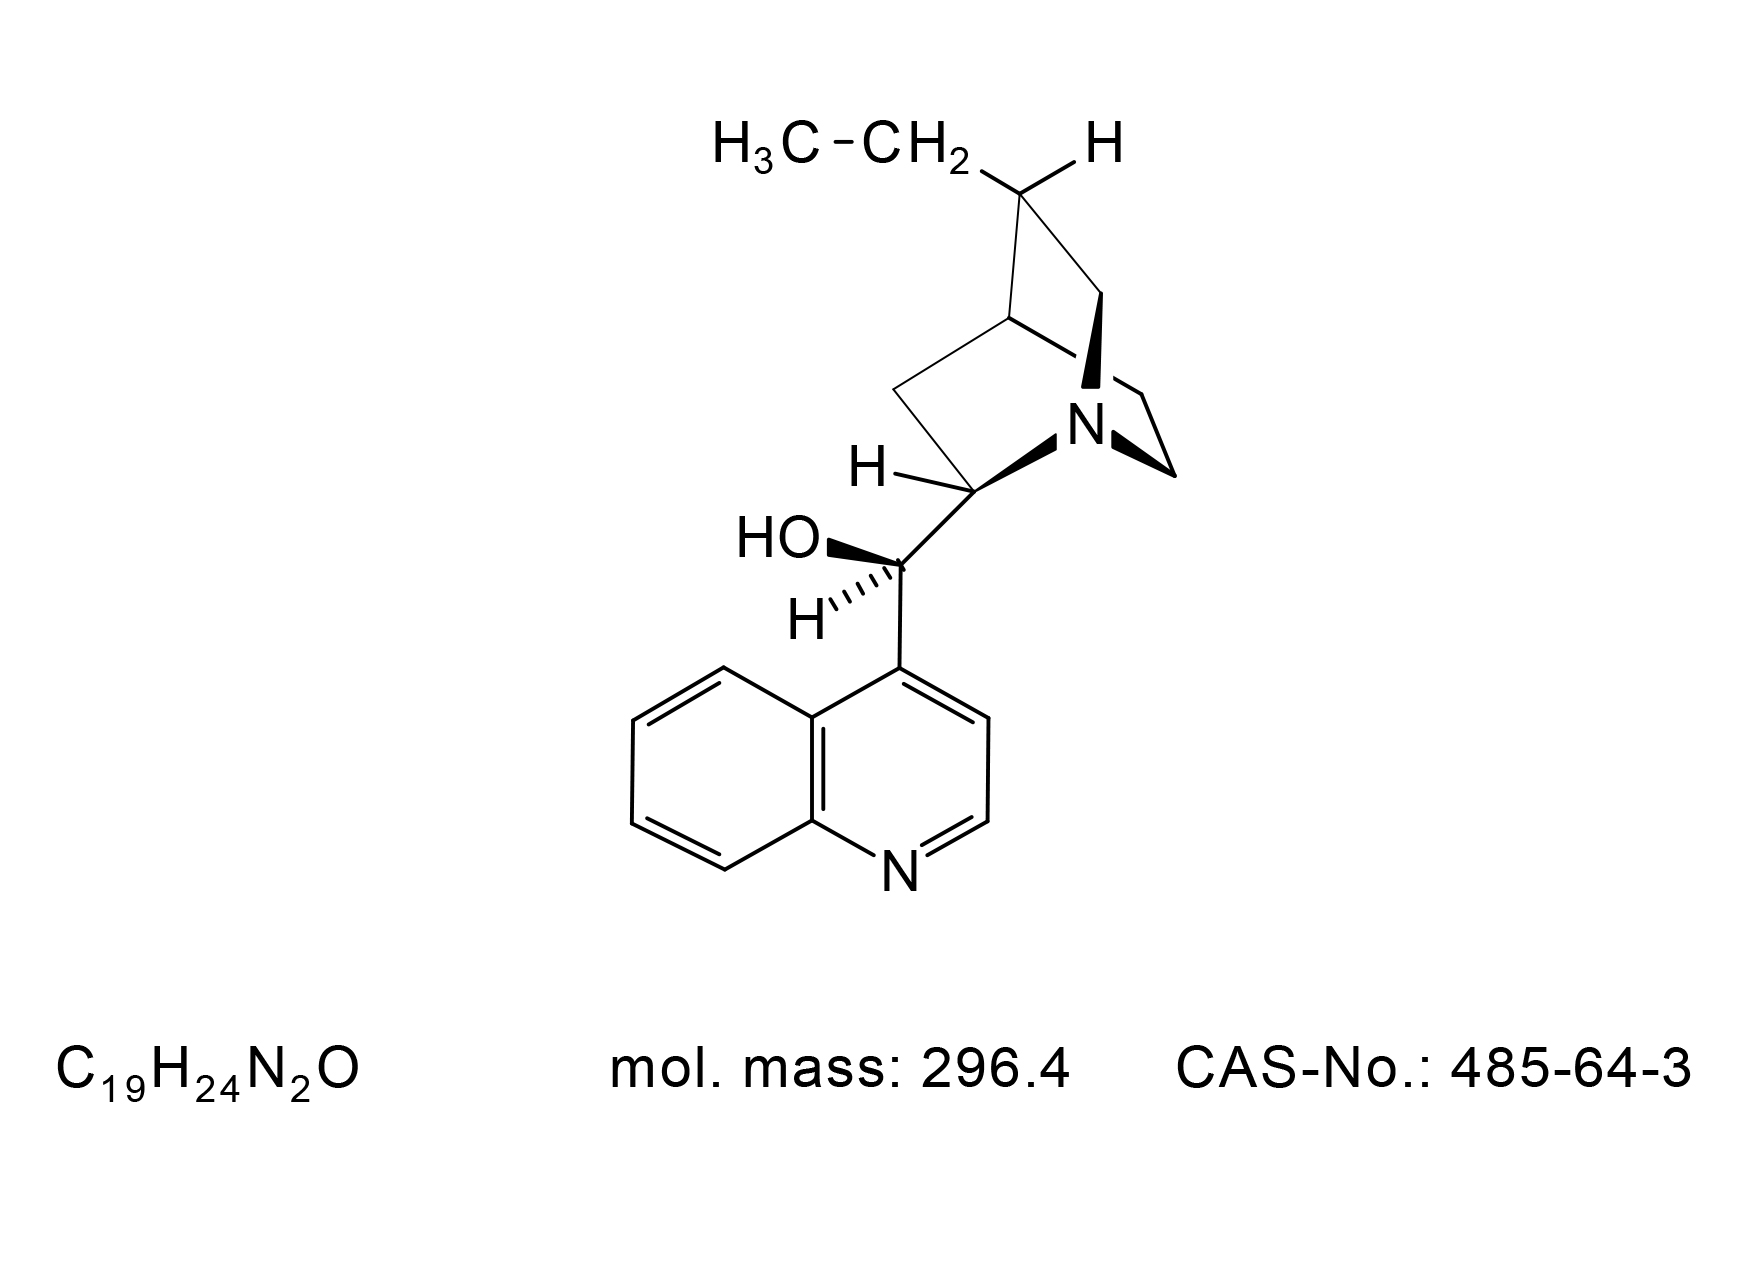 Dihydrocinchonidine - Chemical Structure